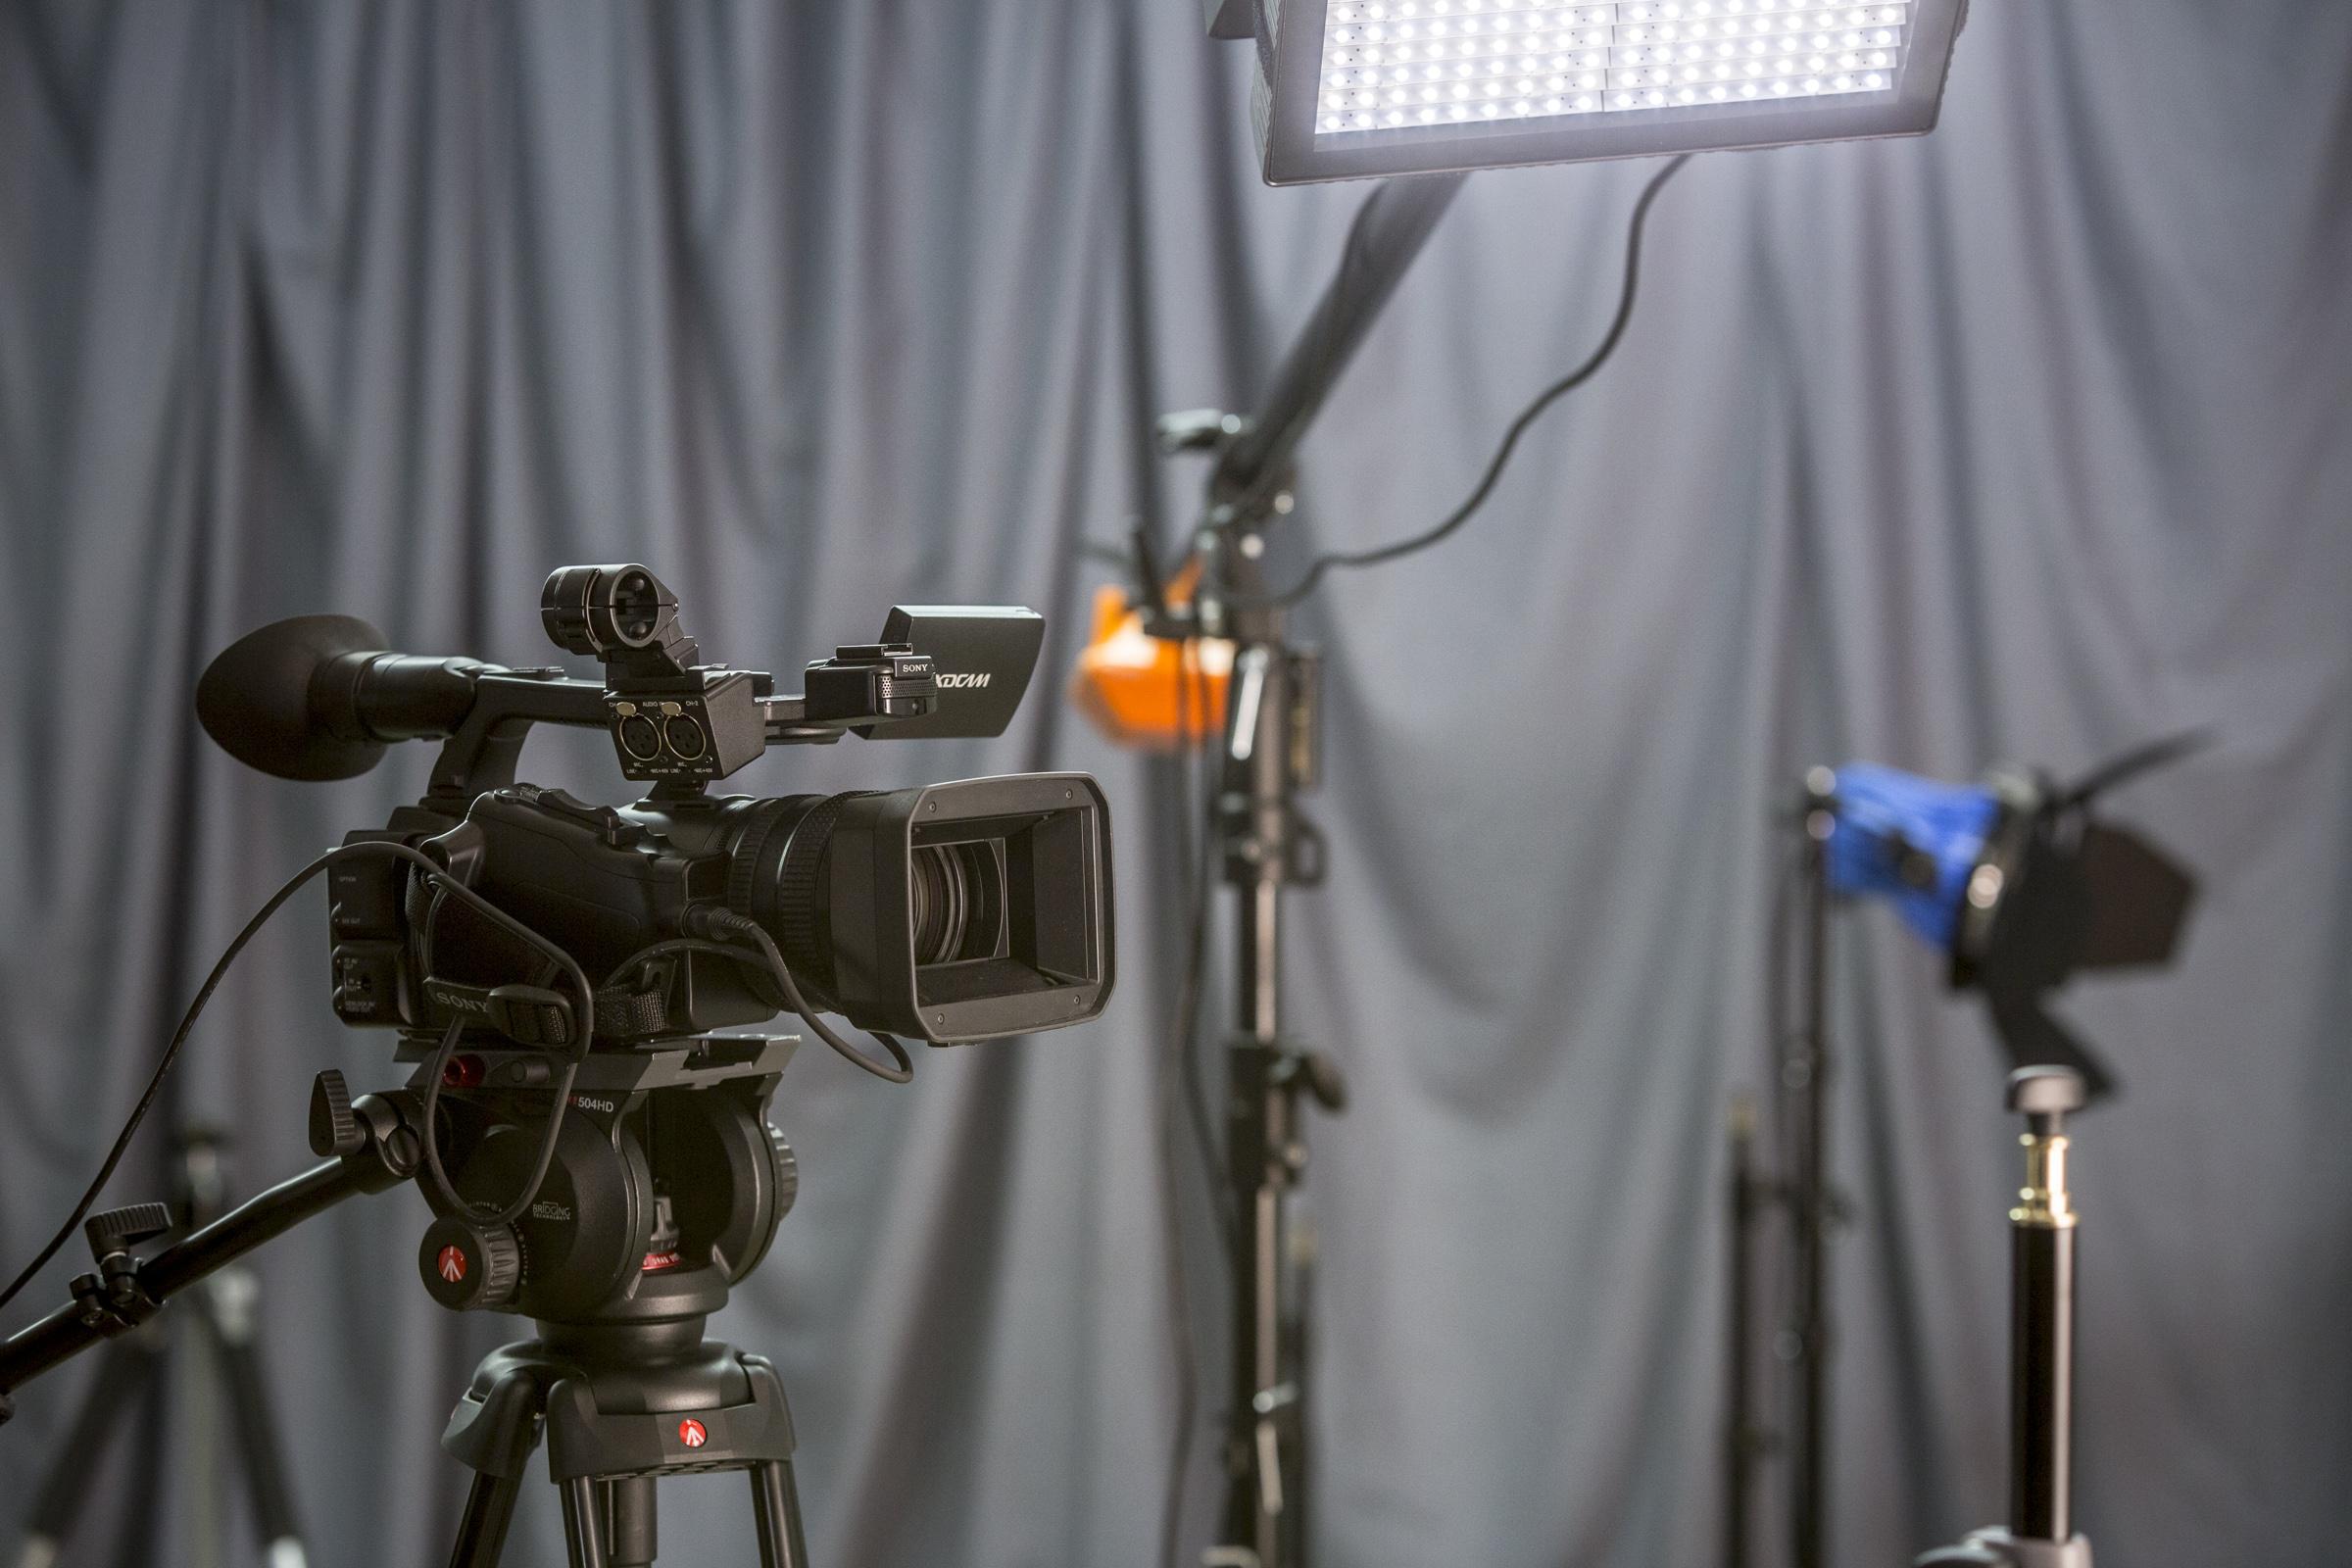 cubus.tv Mietstudio